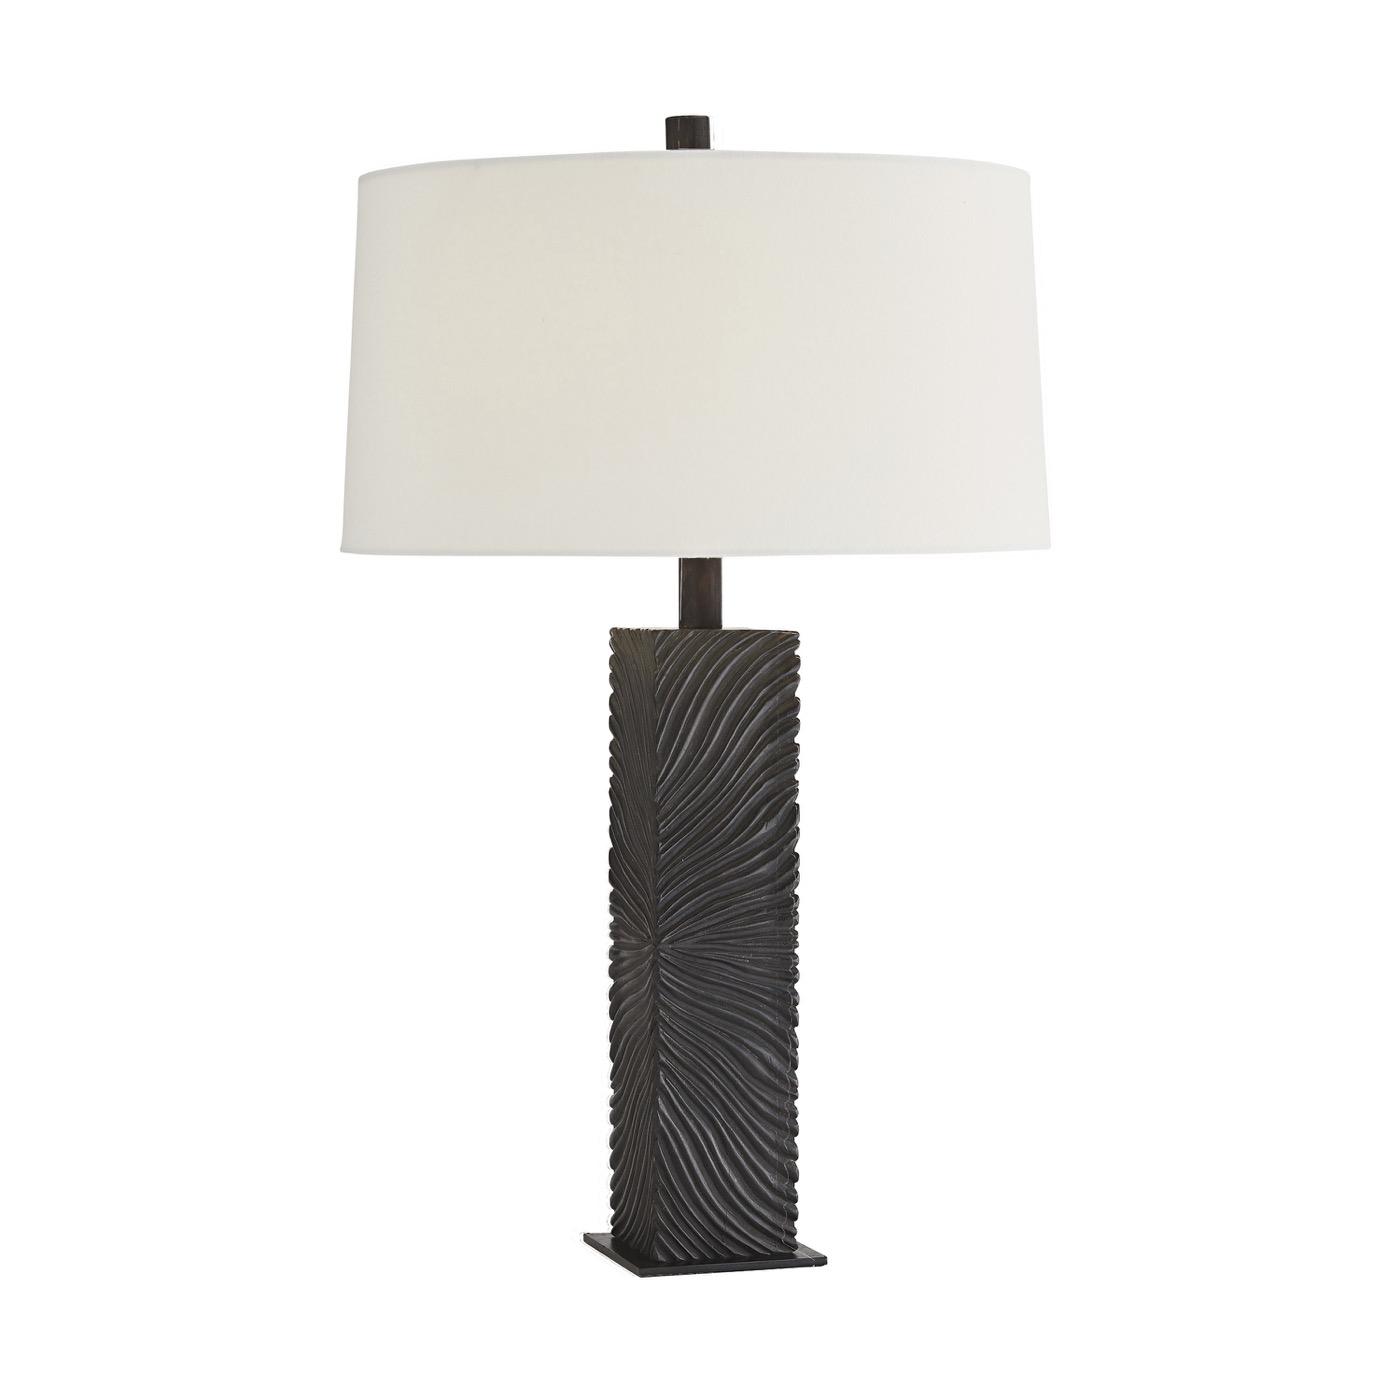 Torga Wood Table Lamp